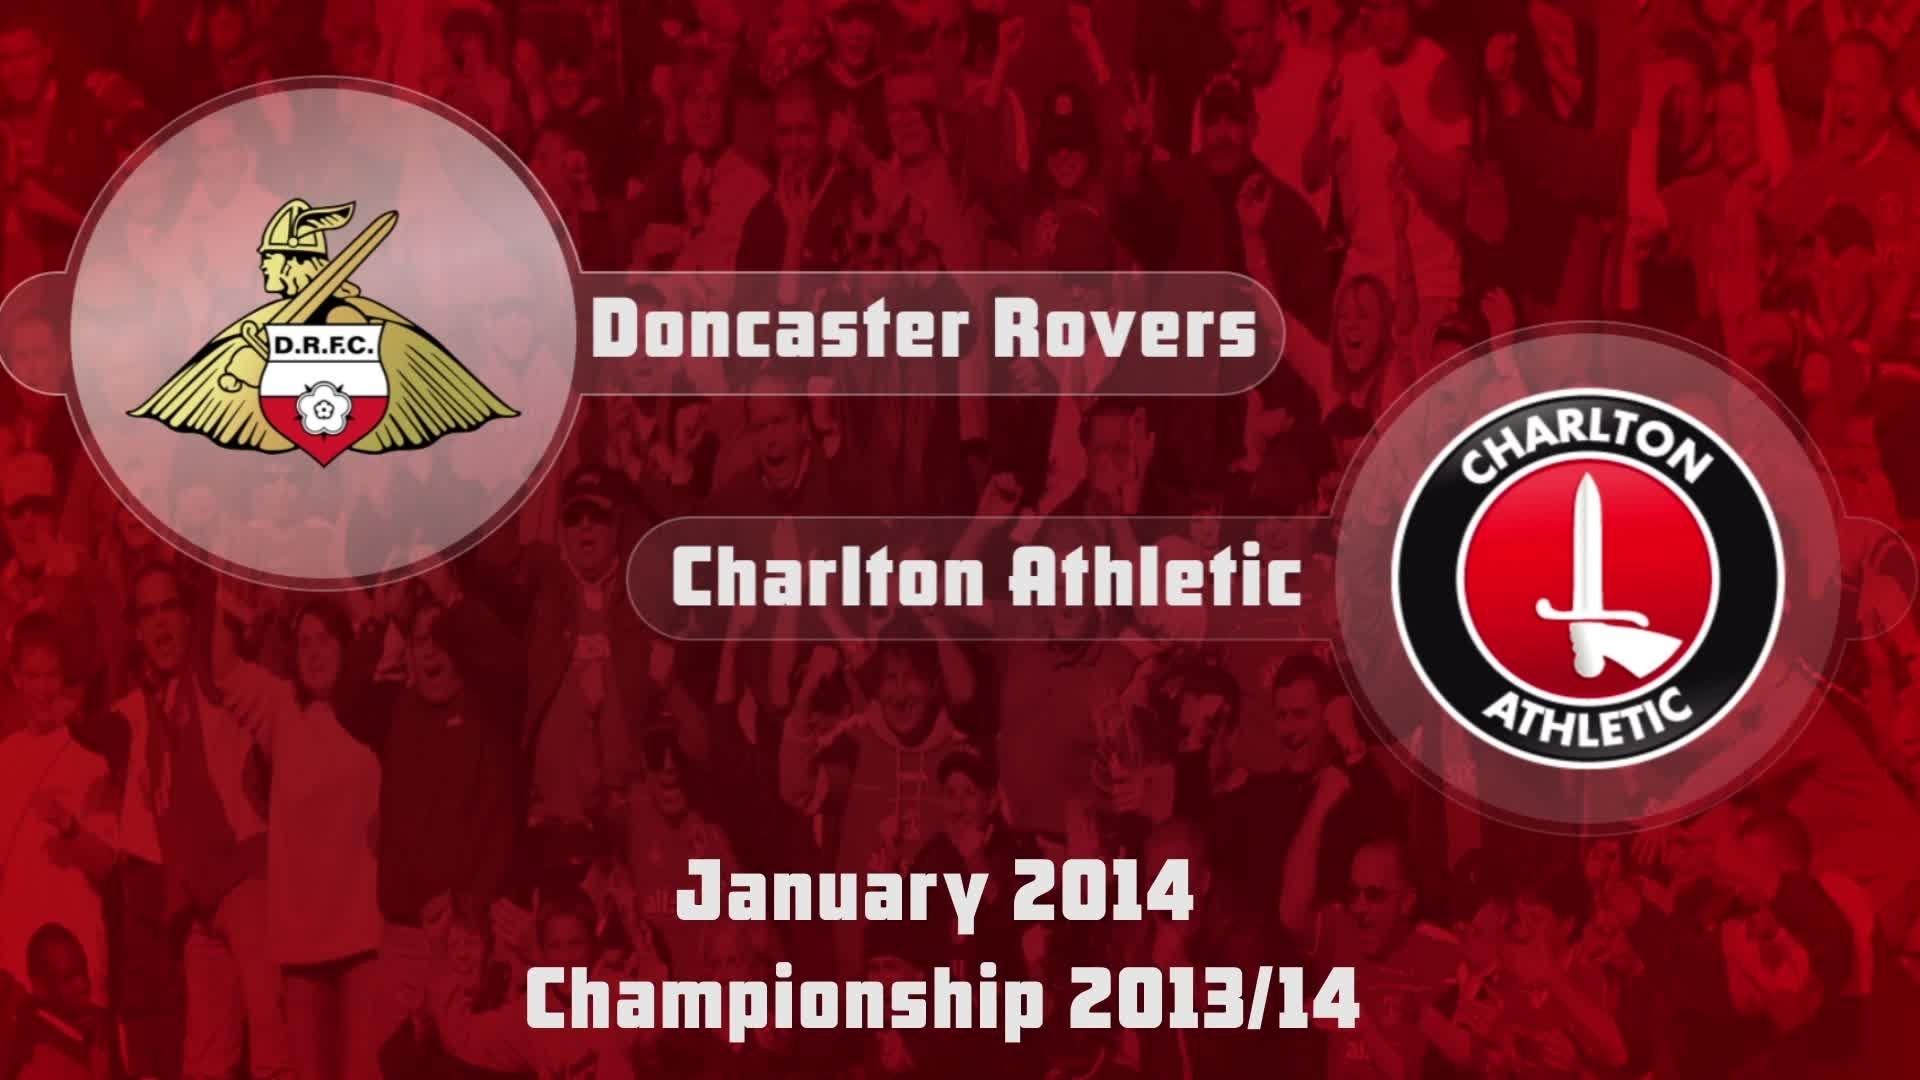 31 HIGHLIGHTS | Doncaster 3 Charlton 0 (Jan 2014)